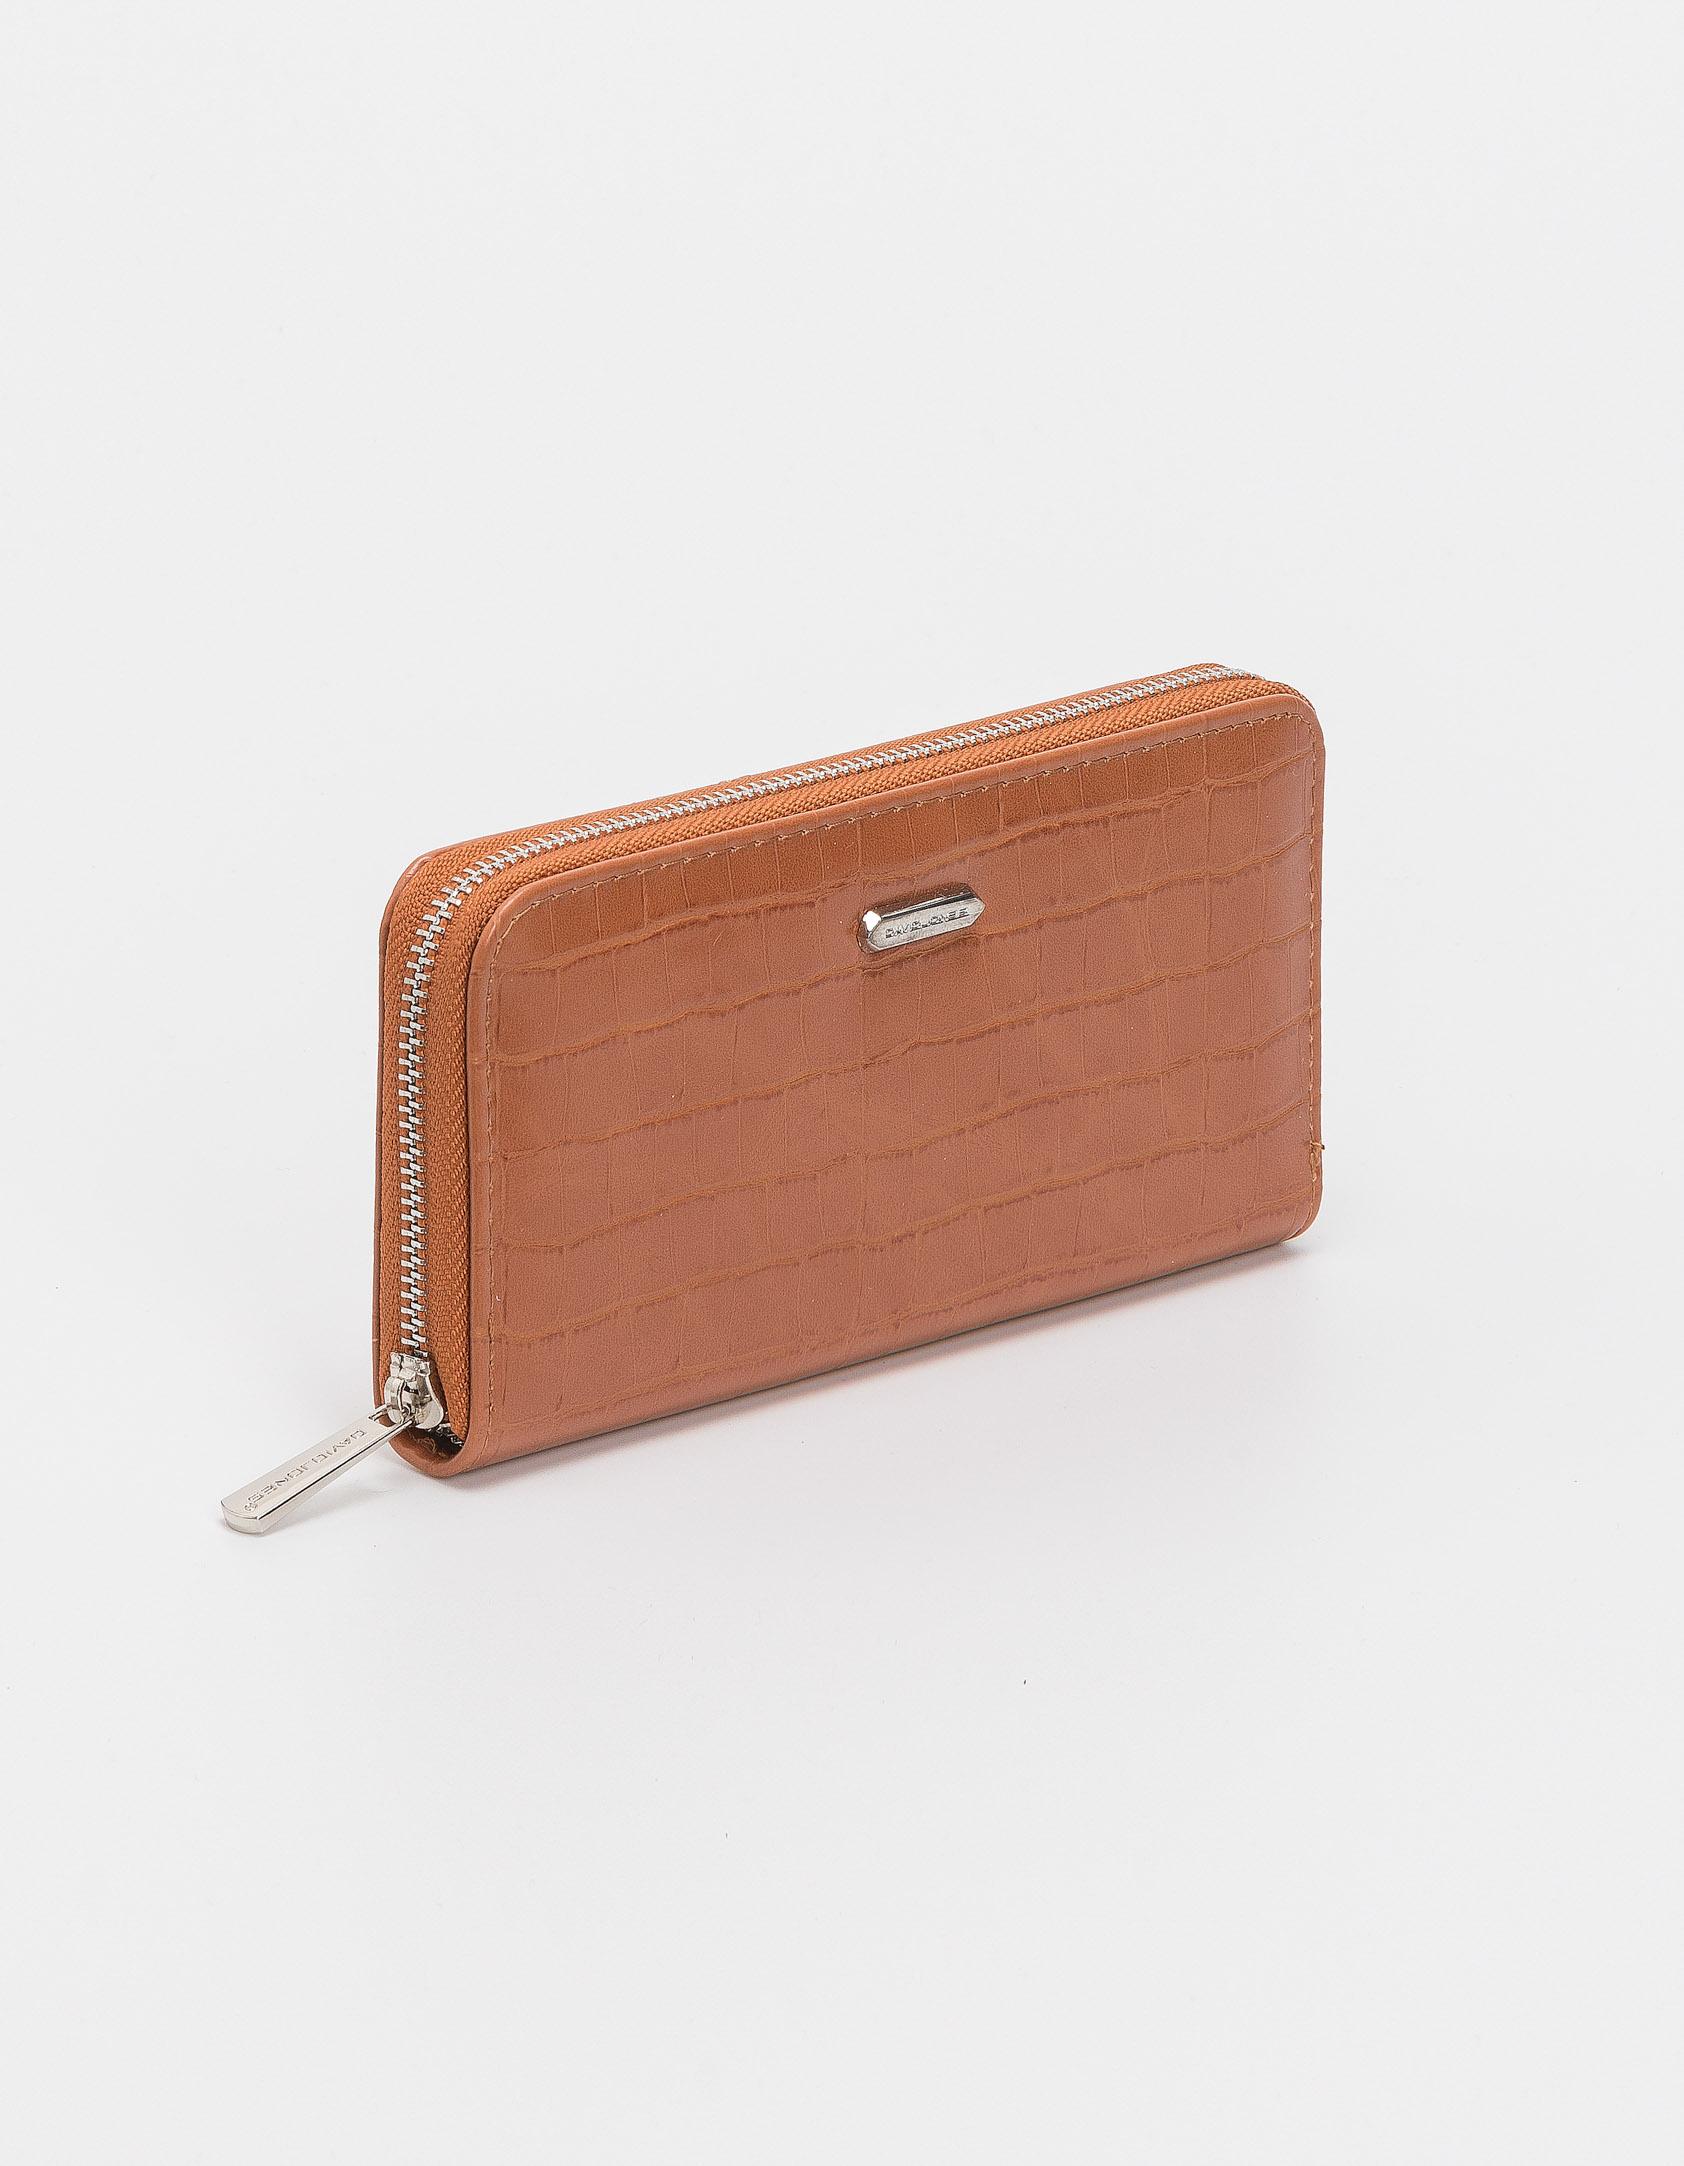 Croco πορτοφόλι με φερμουάρ - Κάμελ